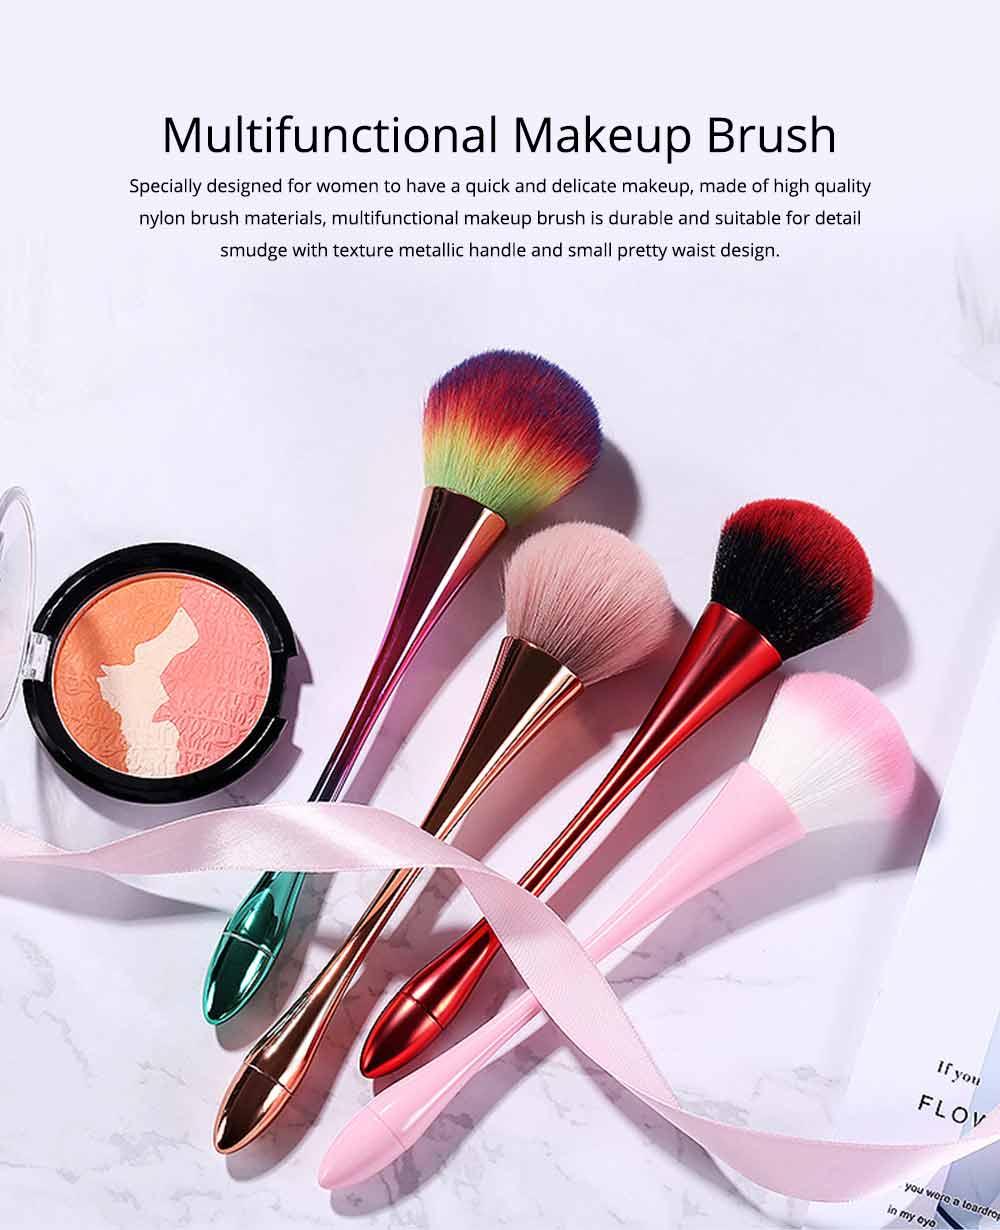 Multifunctional Makeup Brush with Small Pretty Waist, Beauty Makeup Blush Powder Painting as Powder Paint and Blush Brush 0